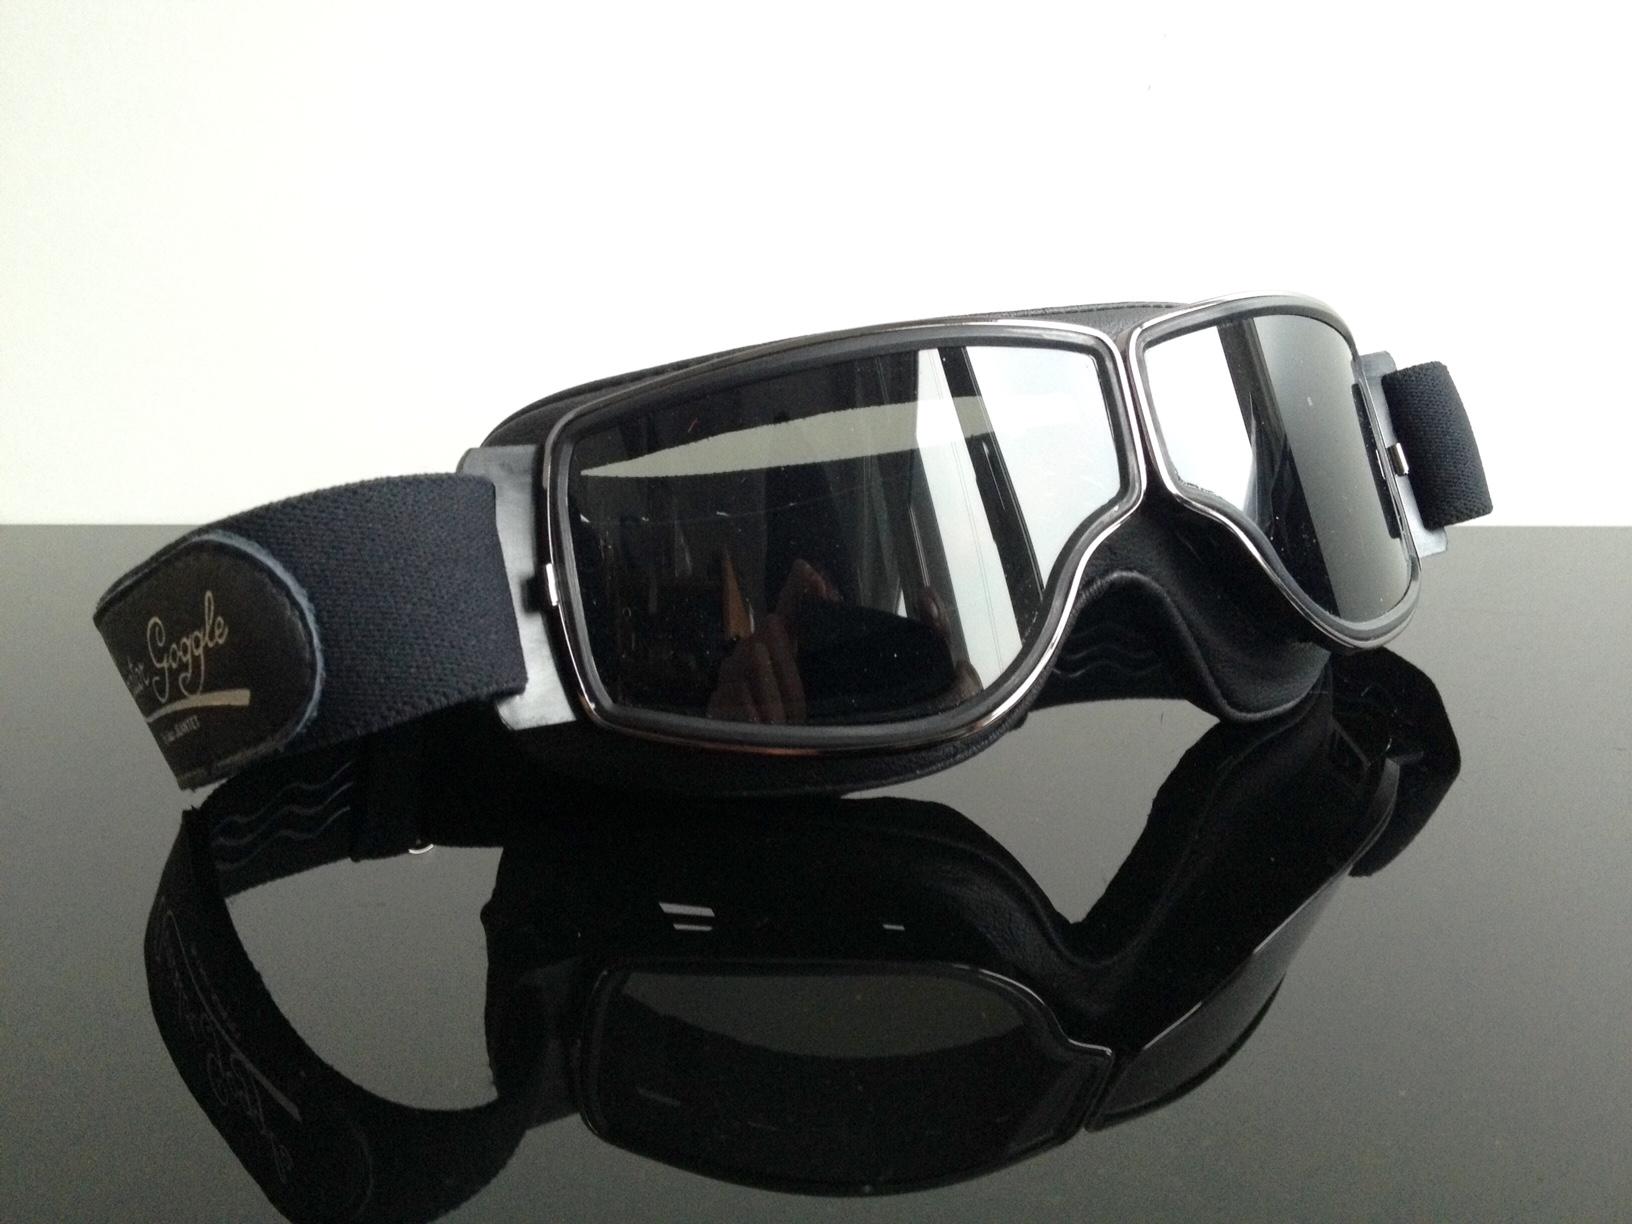 aviator motorradbrille brille goggles lunettes occhiali. Black Bedroom Furniture Sets. Home Design Ideas